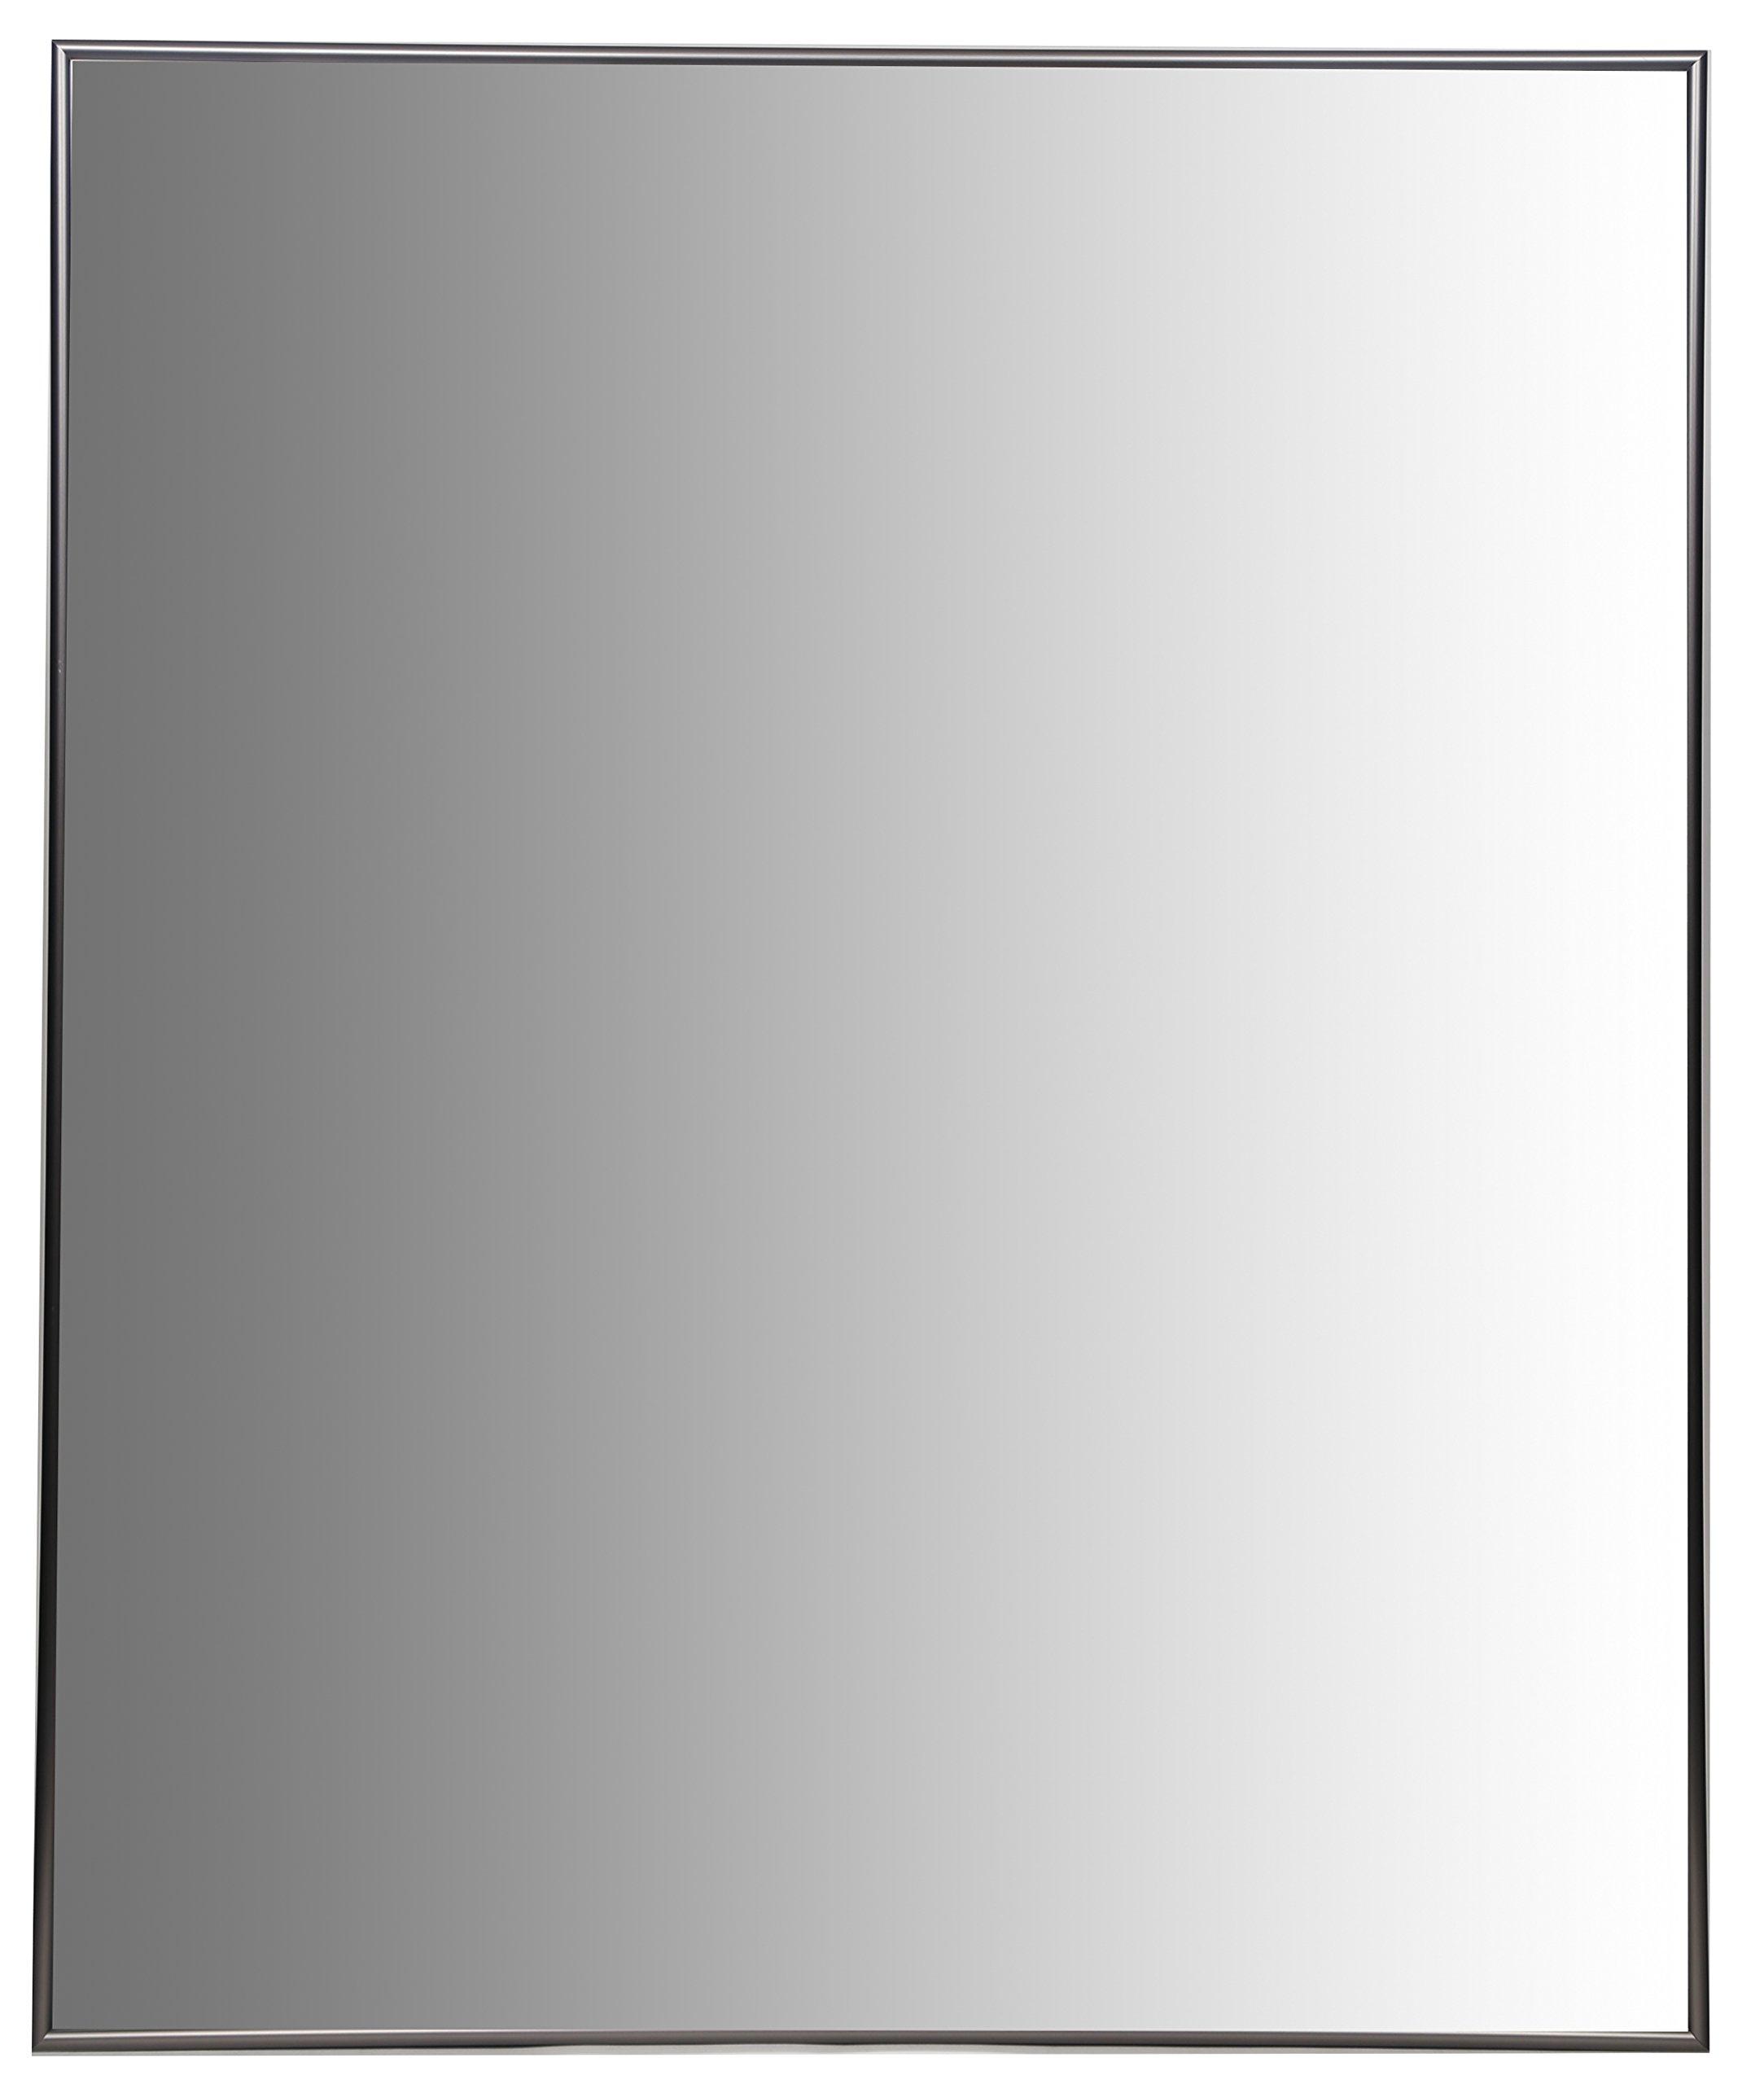 Nielsen Bainbridge 24x30 Rectangular Aluminum Wall Mirror | Vanity Mirror, Bedroom or Bathroom | Hangs Horizontal or Vertical | Nickel